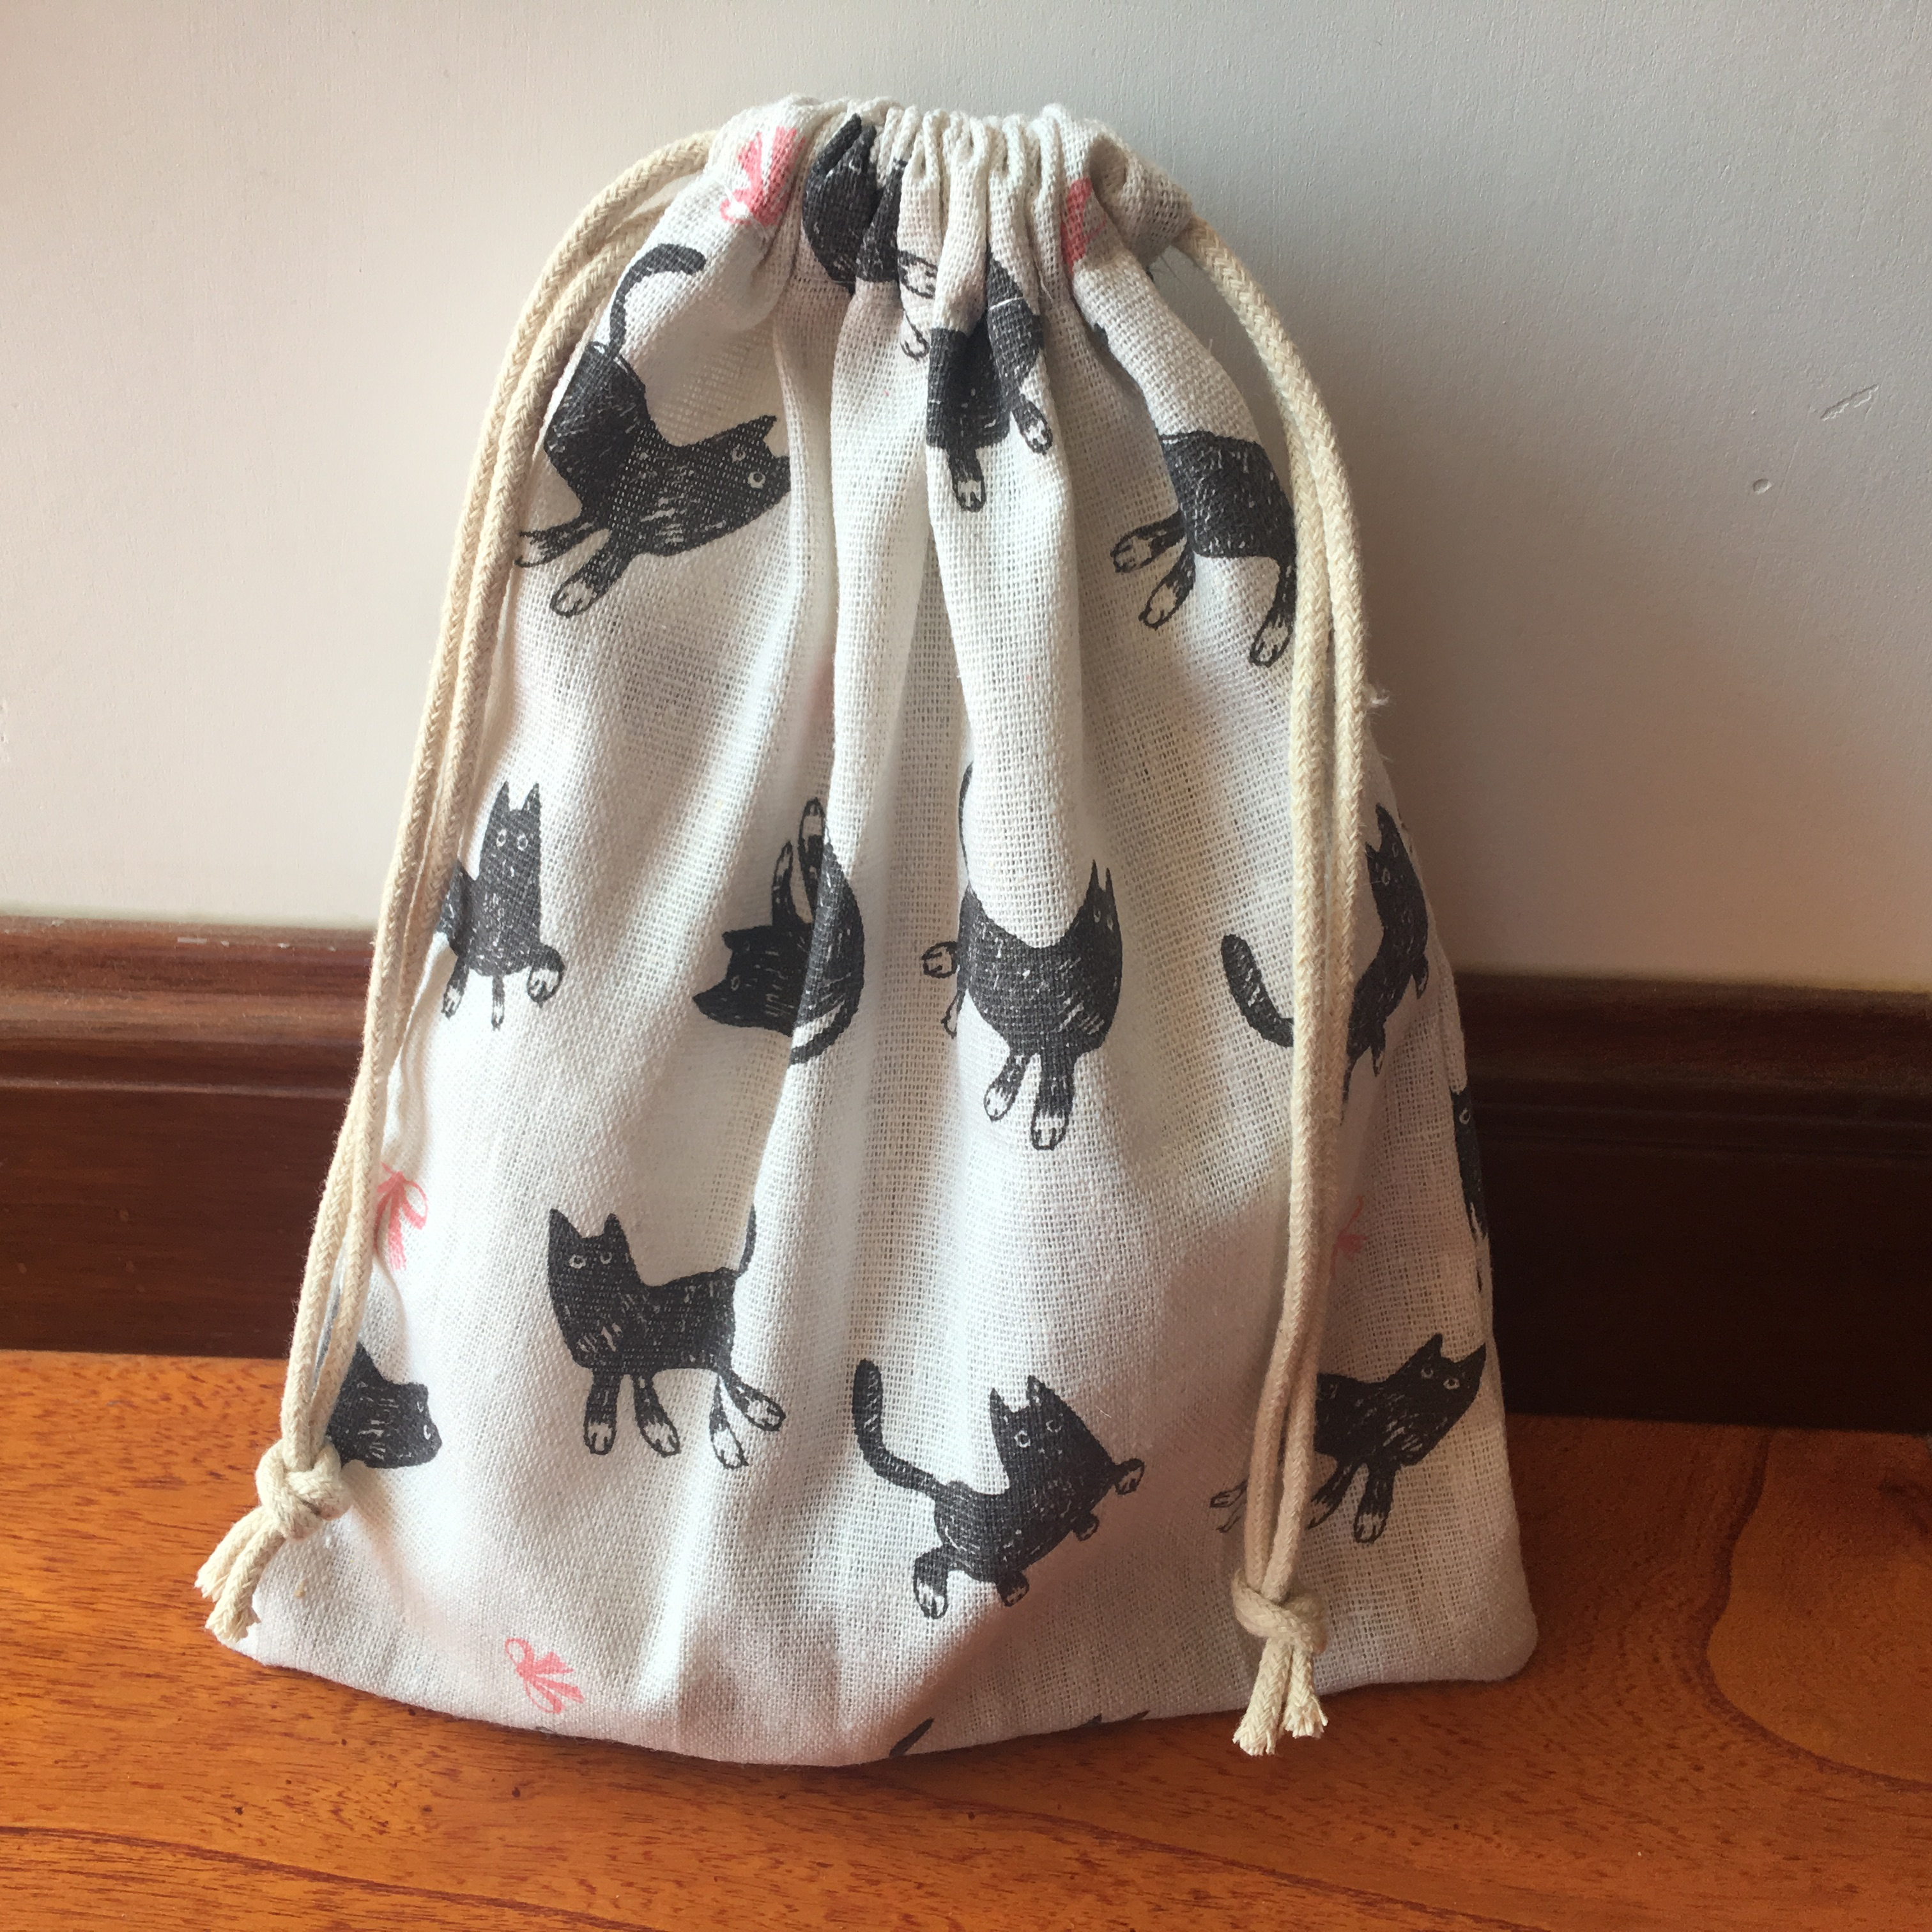 1pc Cotton Linen Drawstring Multi-purpose Pouch Party Gift Bag Black Cat Pink Bowknot YI